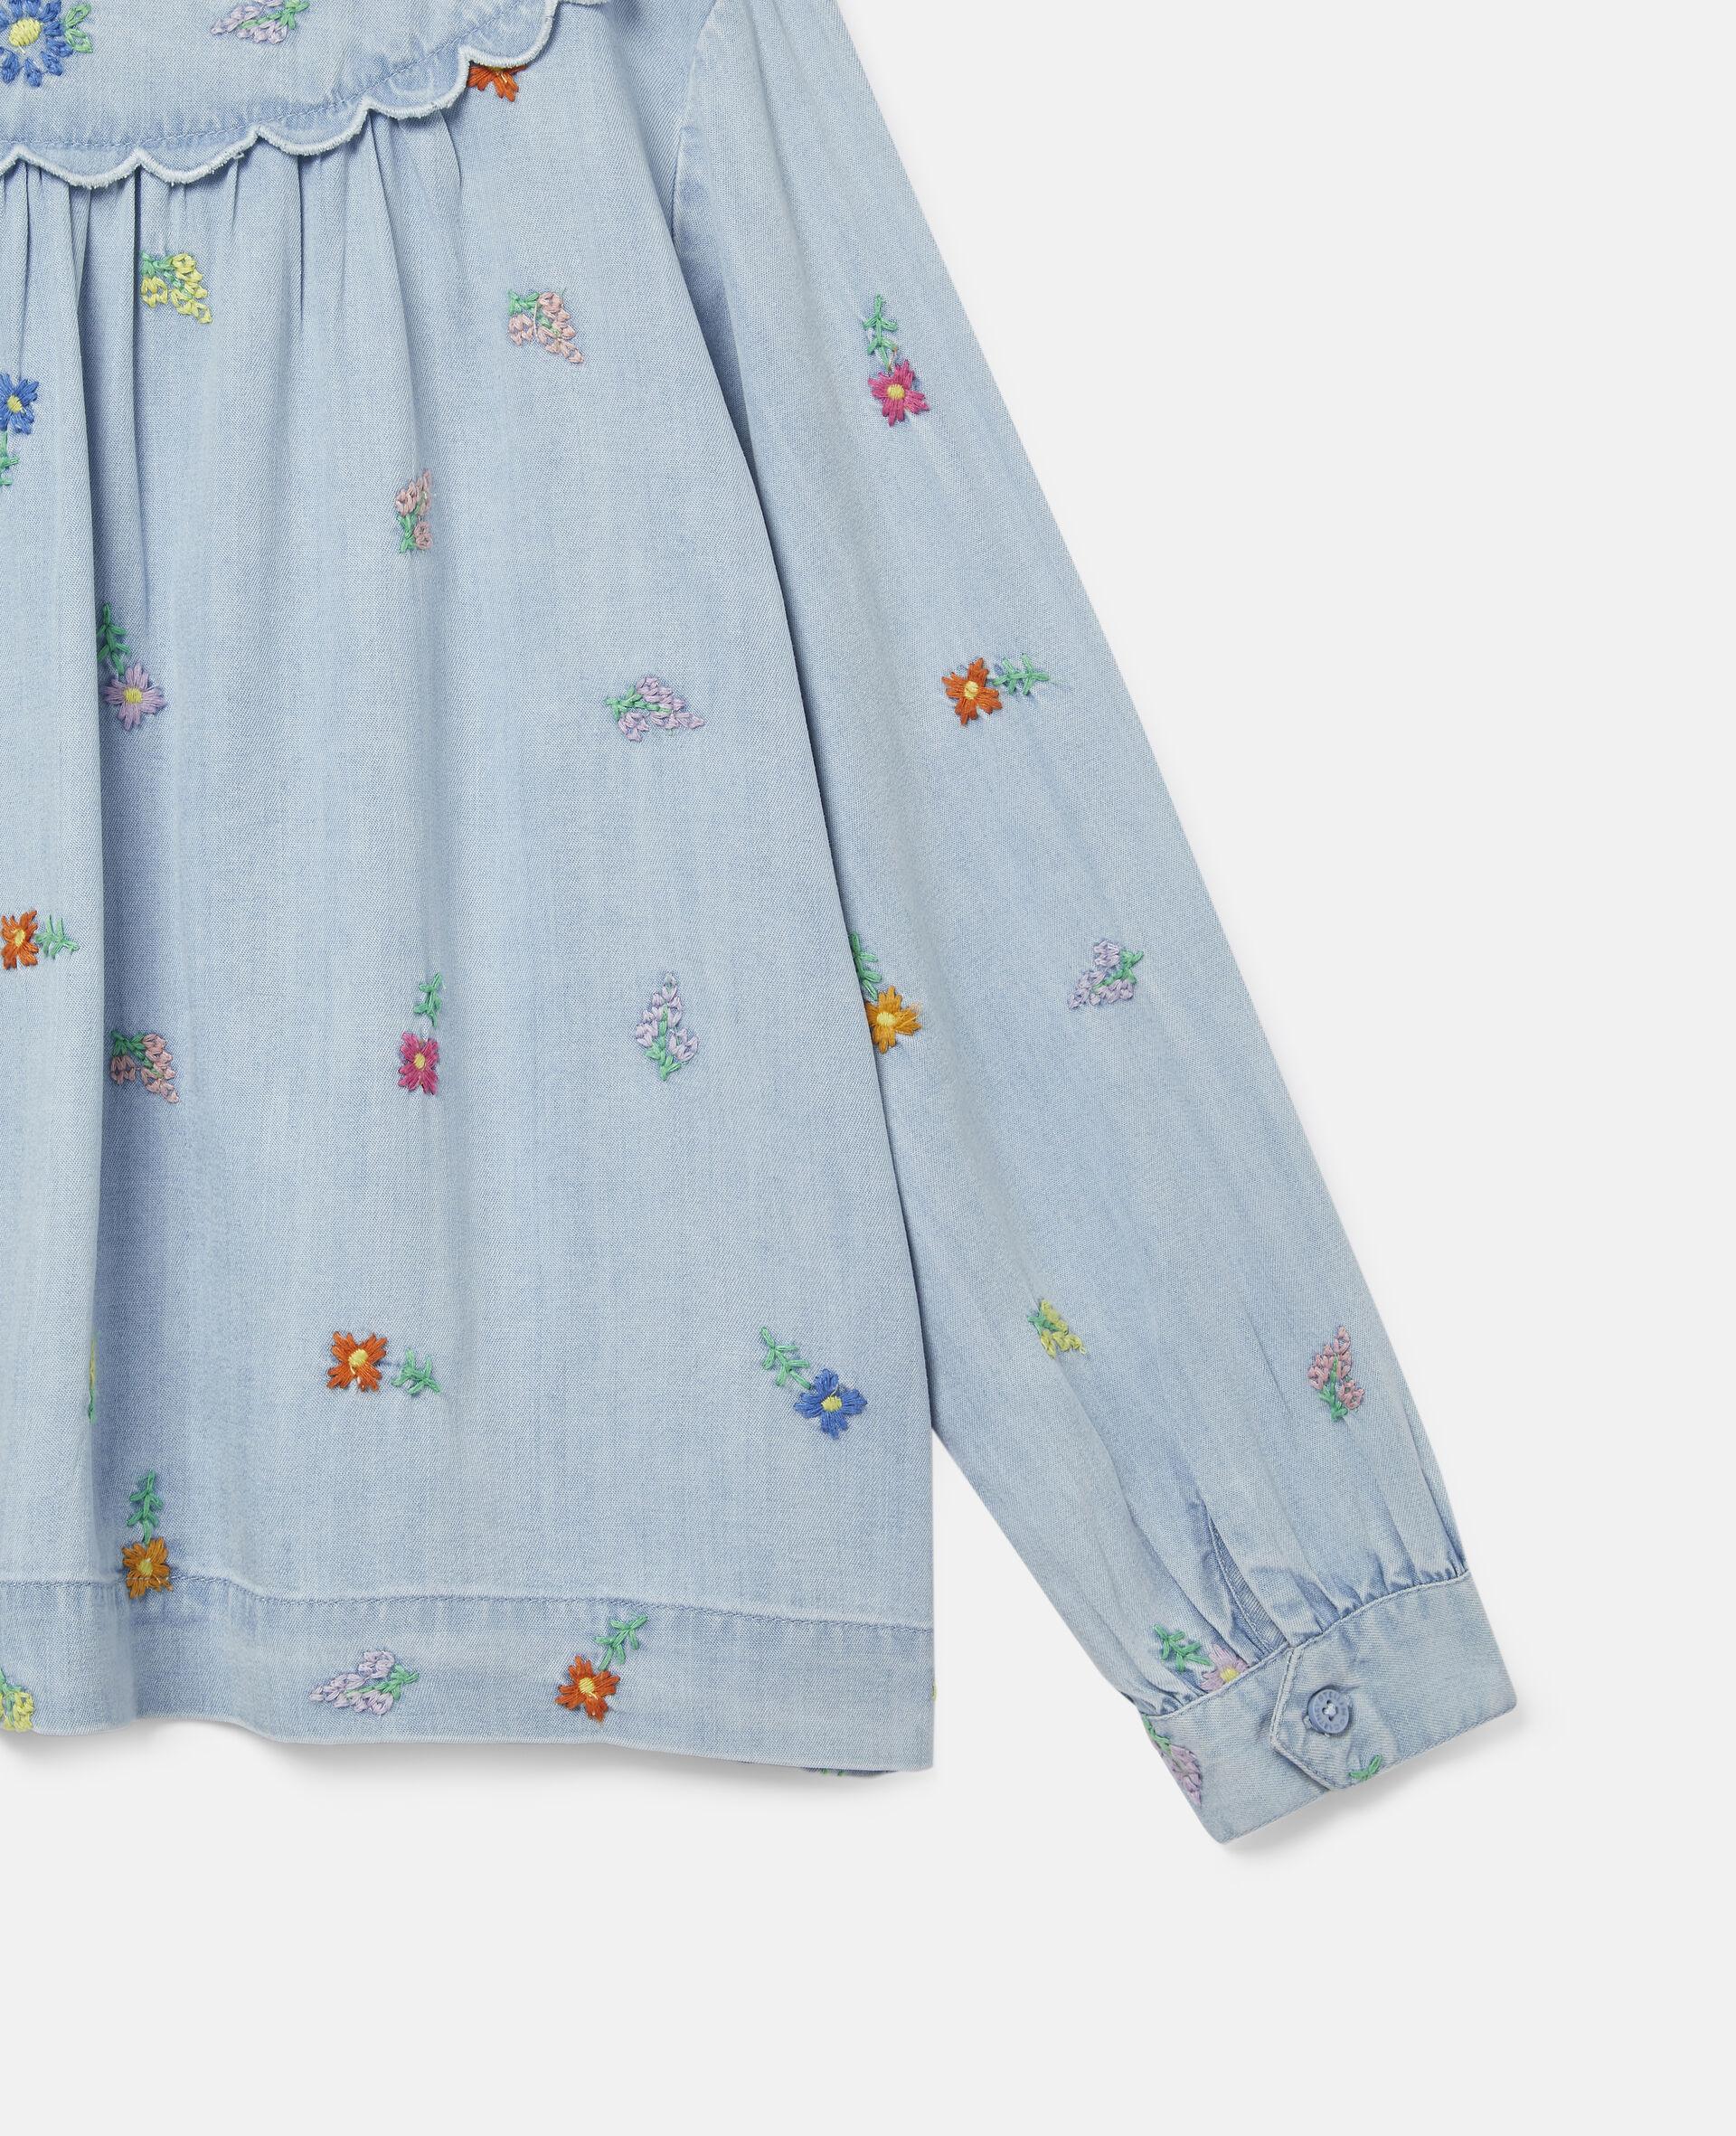 Embroidered Flowers Denim Shirt-Blue-large image number 1